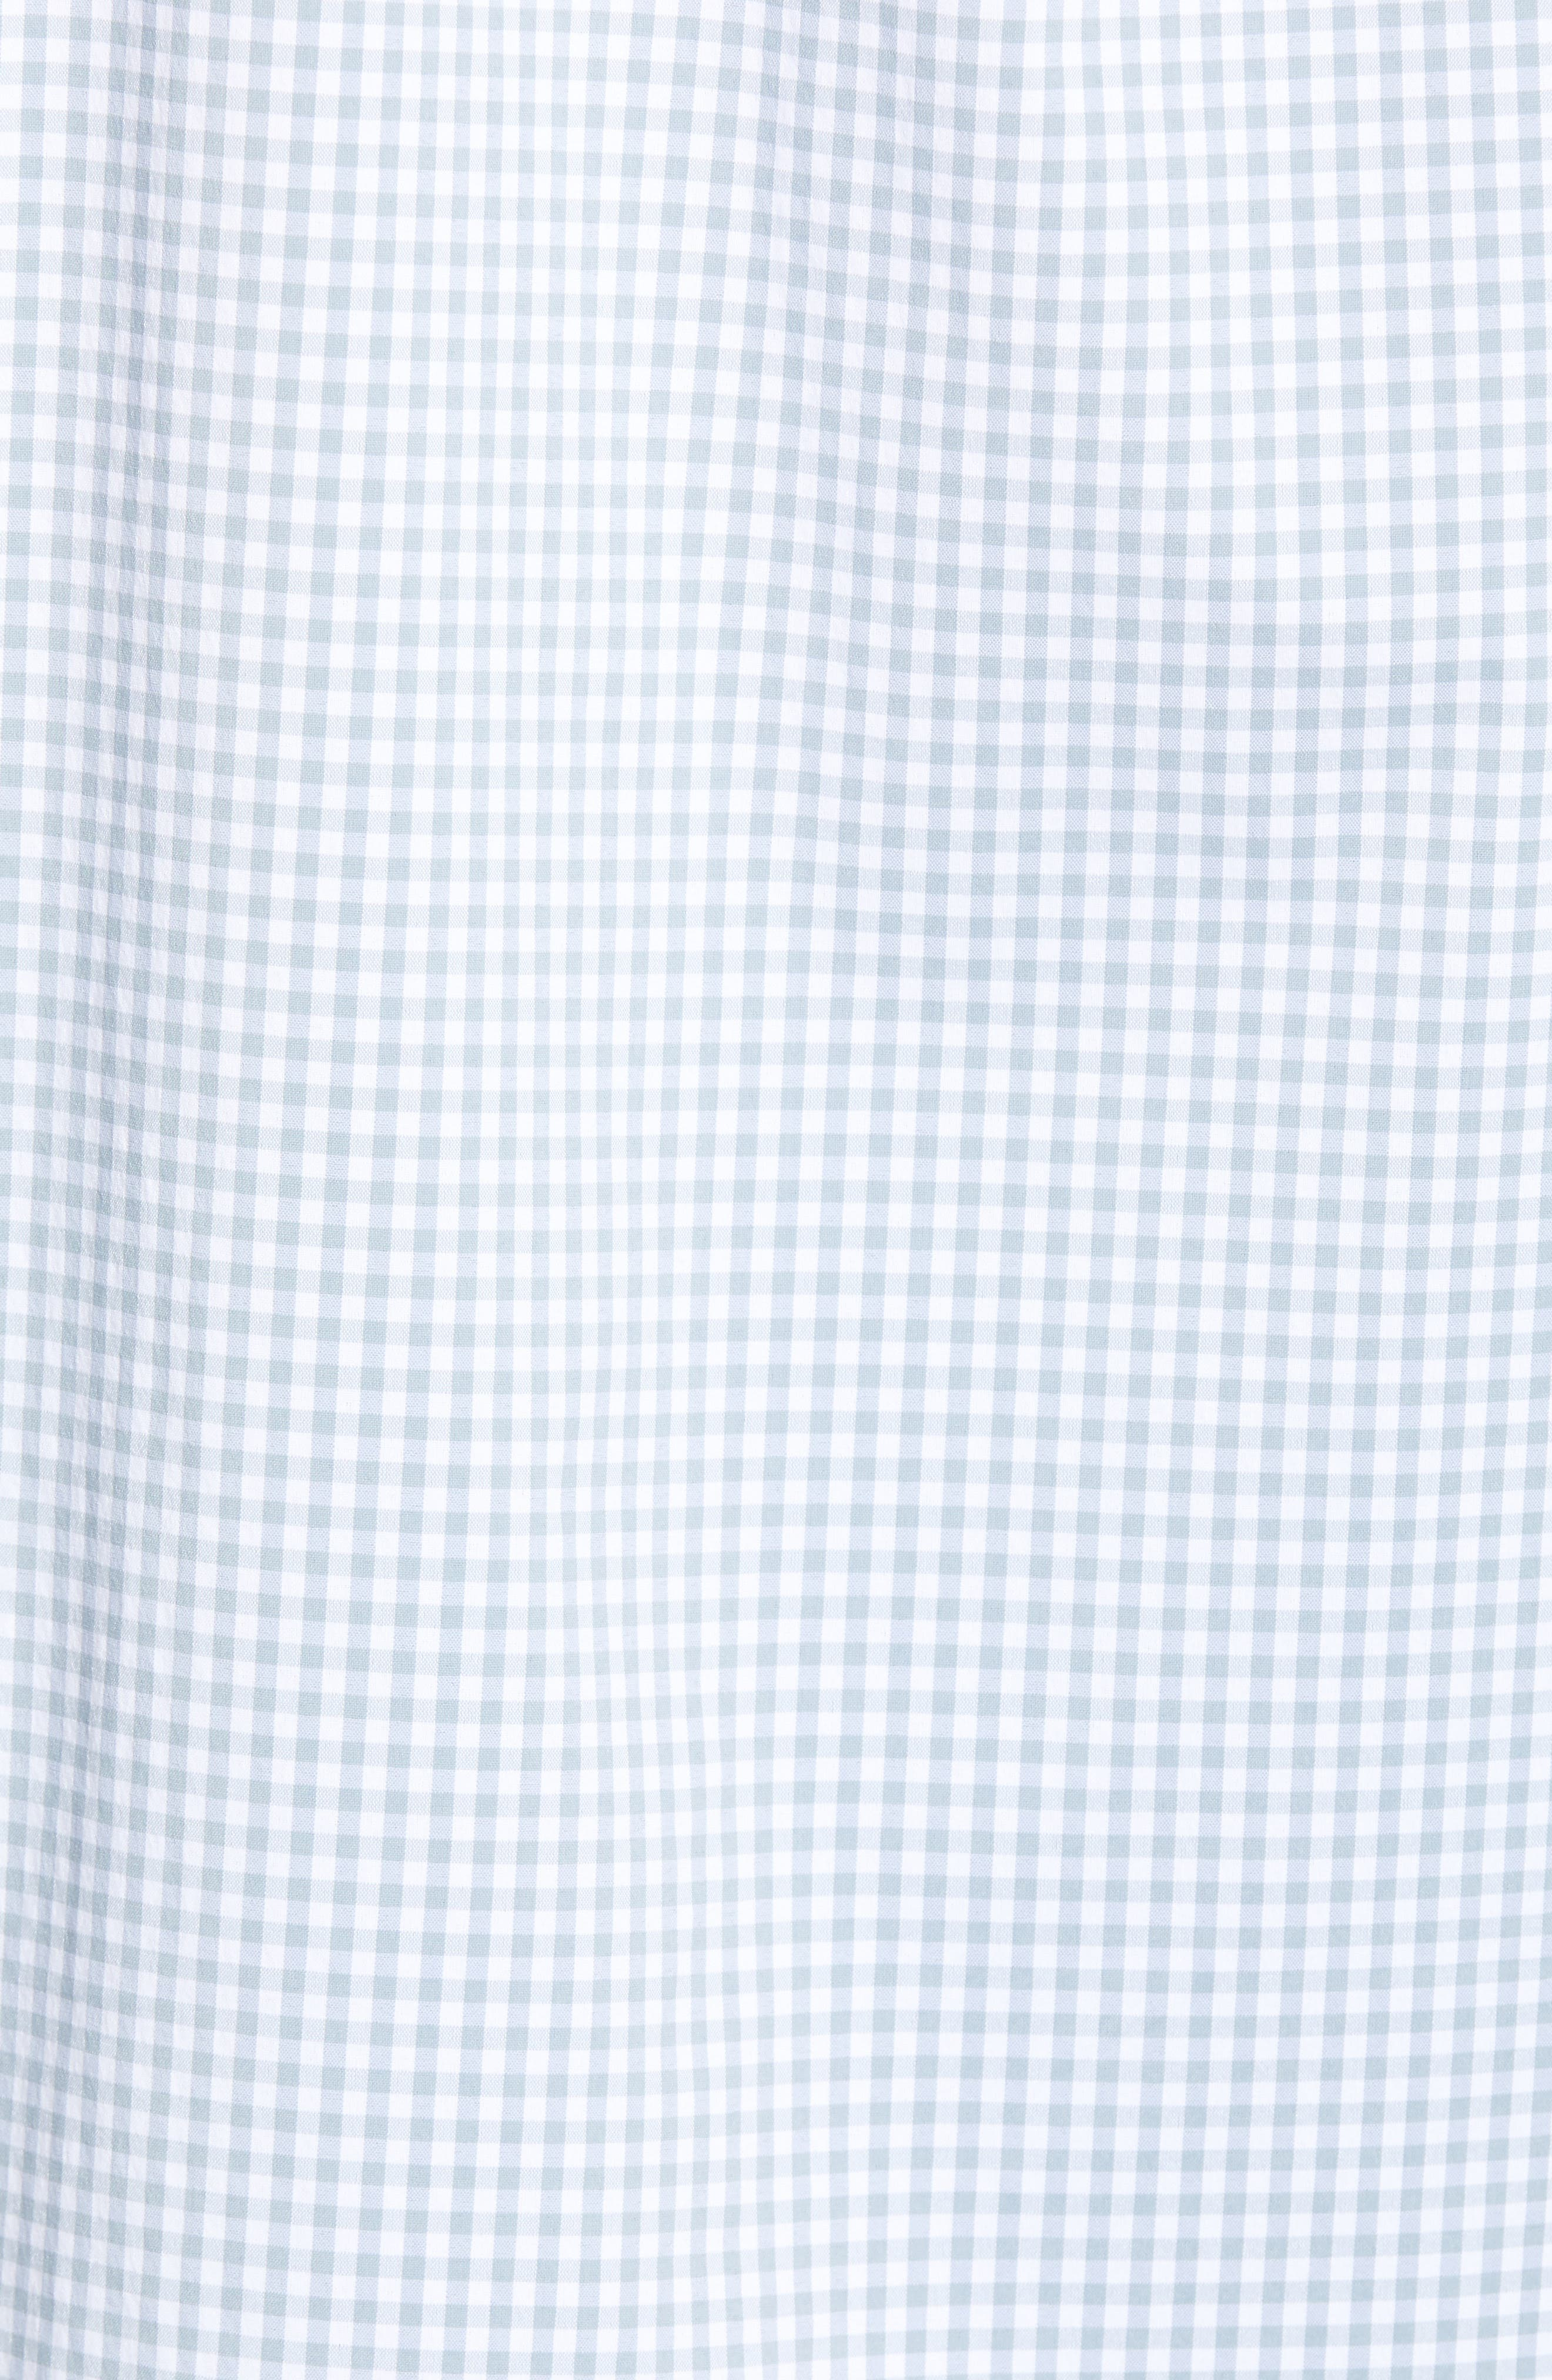 VINEYARD VINES,                             Grand Cay Tucker Regular Fit Gingham Performance Sport Shirt,                             Alternate thumbnail 5, color,                             023